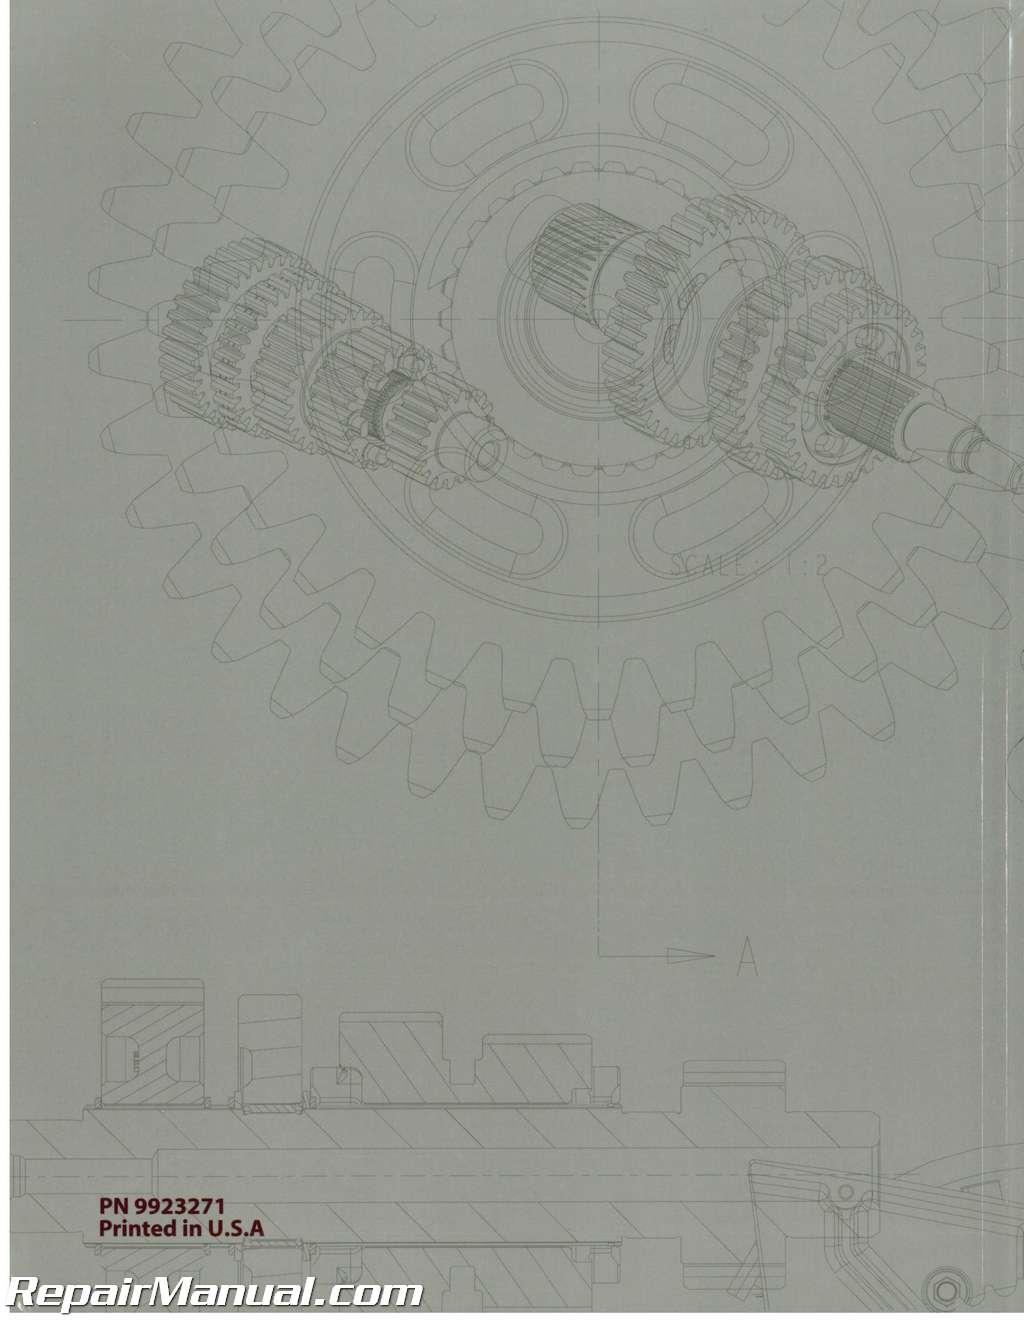 Victory Vision Wiring Diagram. Diagram. Auto Wiring Diagram